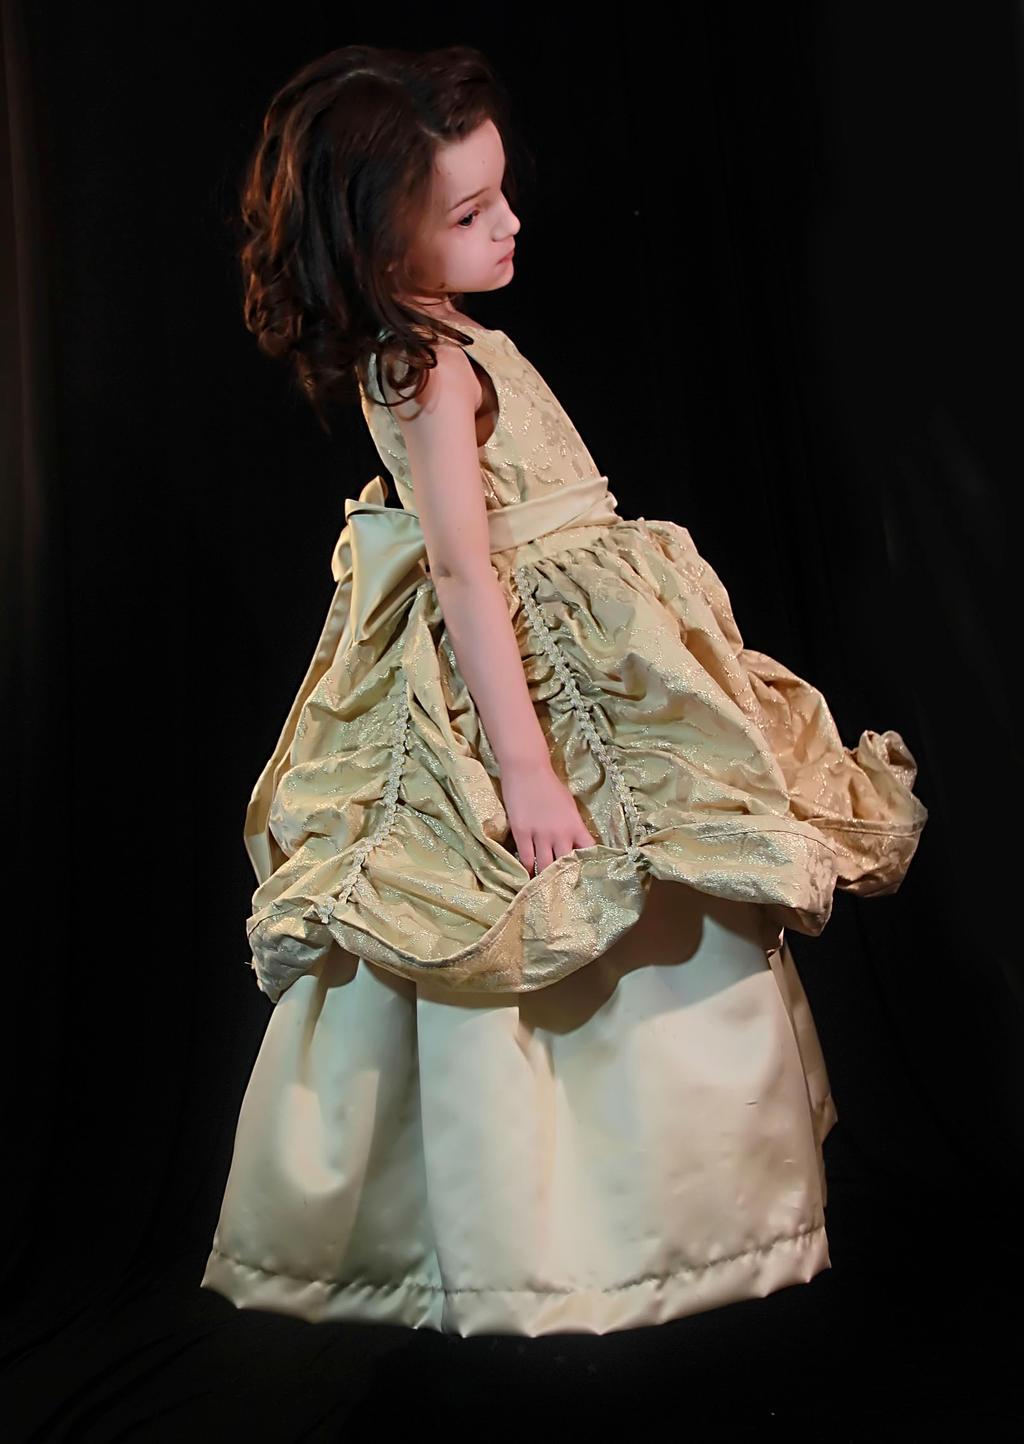 Belle by TwilitesMuse